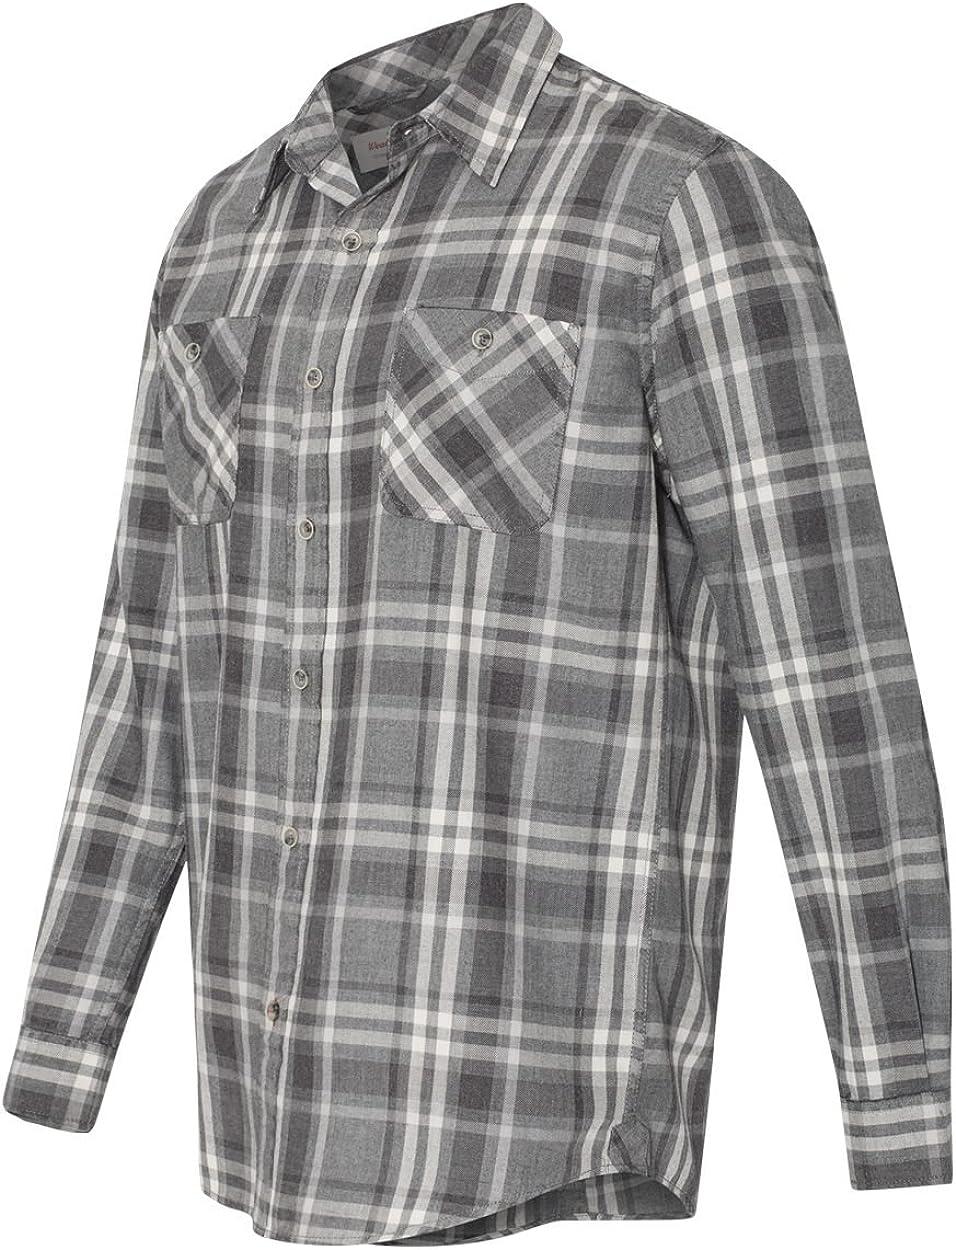 Weatherproof 178573 Vintage Burnout Flannel